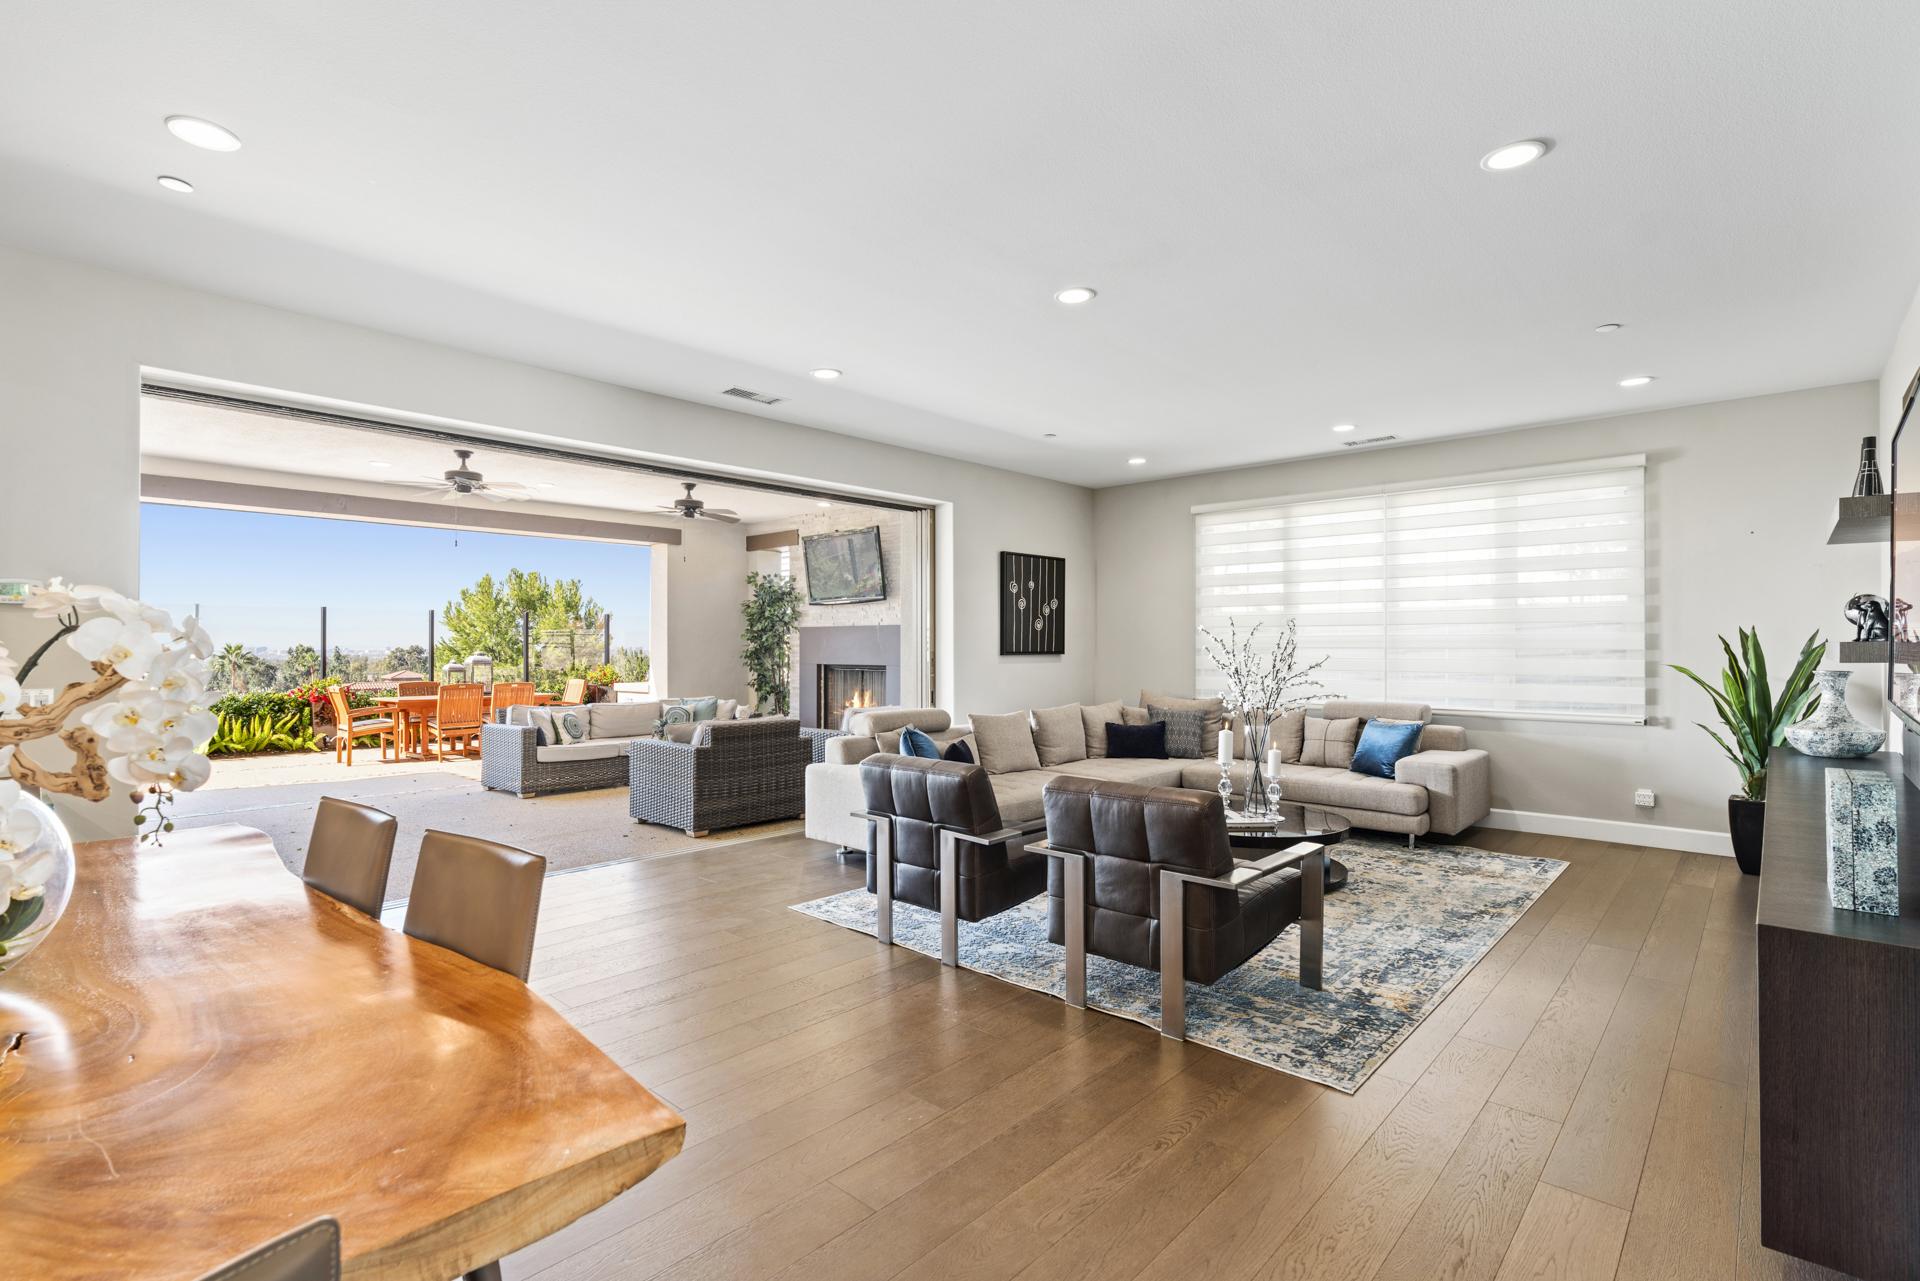 139 Sunset Cv - $2,200,000